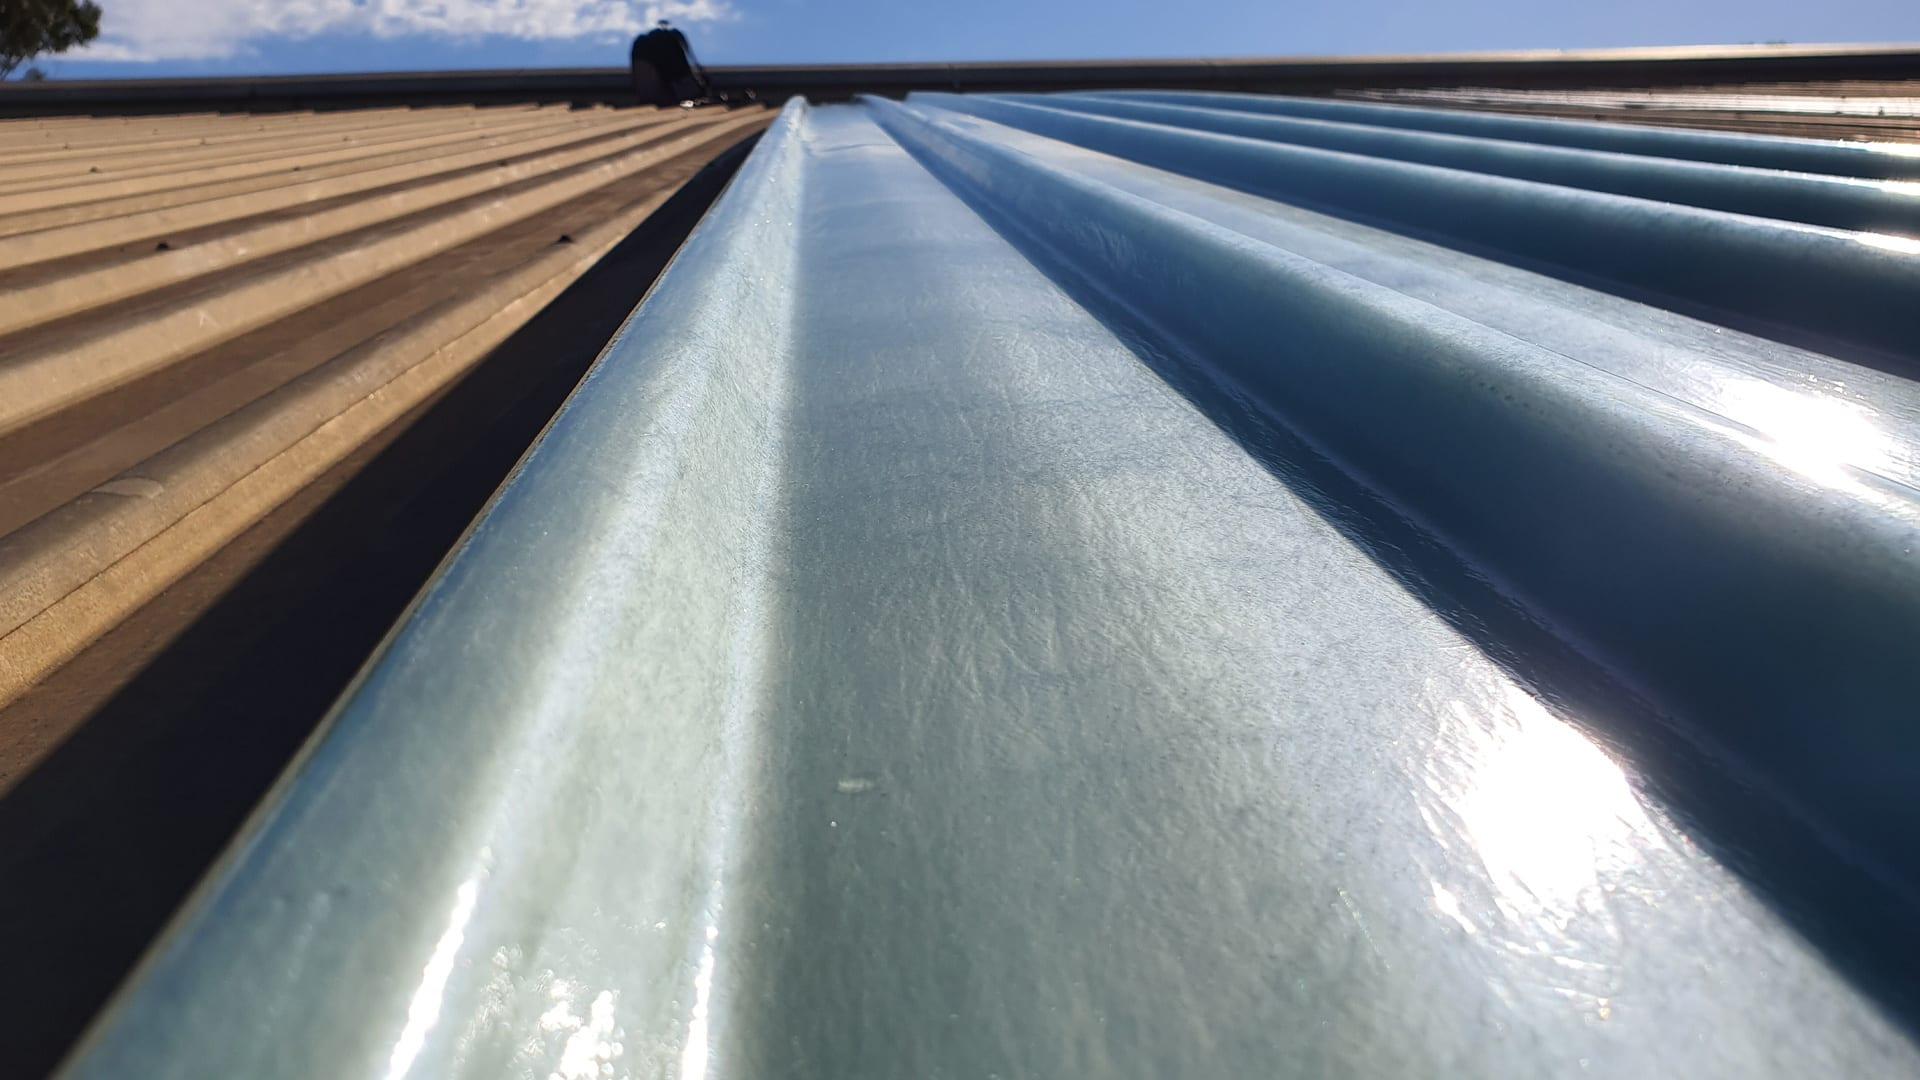 New Fibreglass Skylight Roofing Panels Sydney